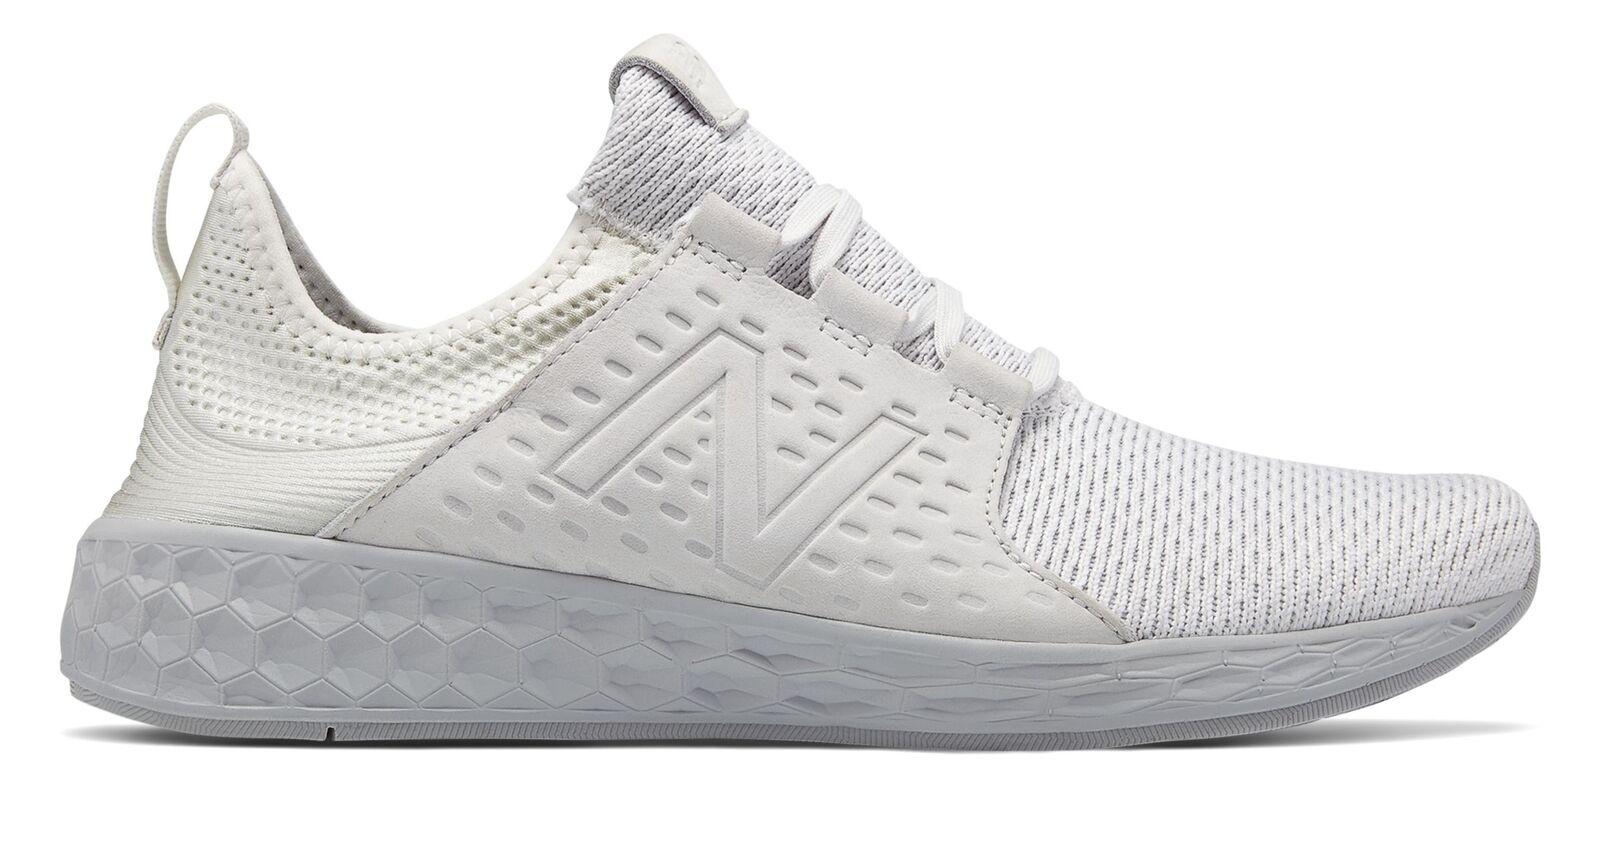 New Balance hommes Fresh Foam Cruz Chaussures blanc